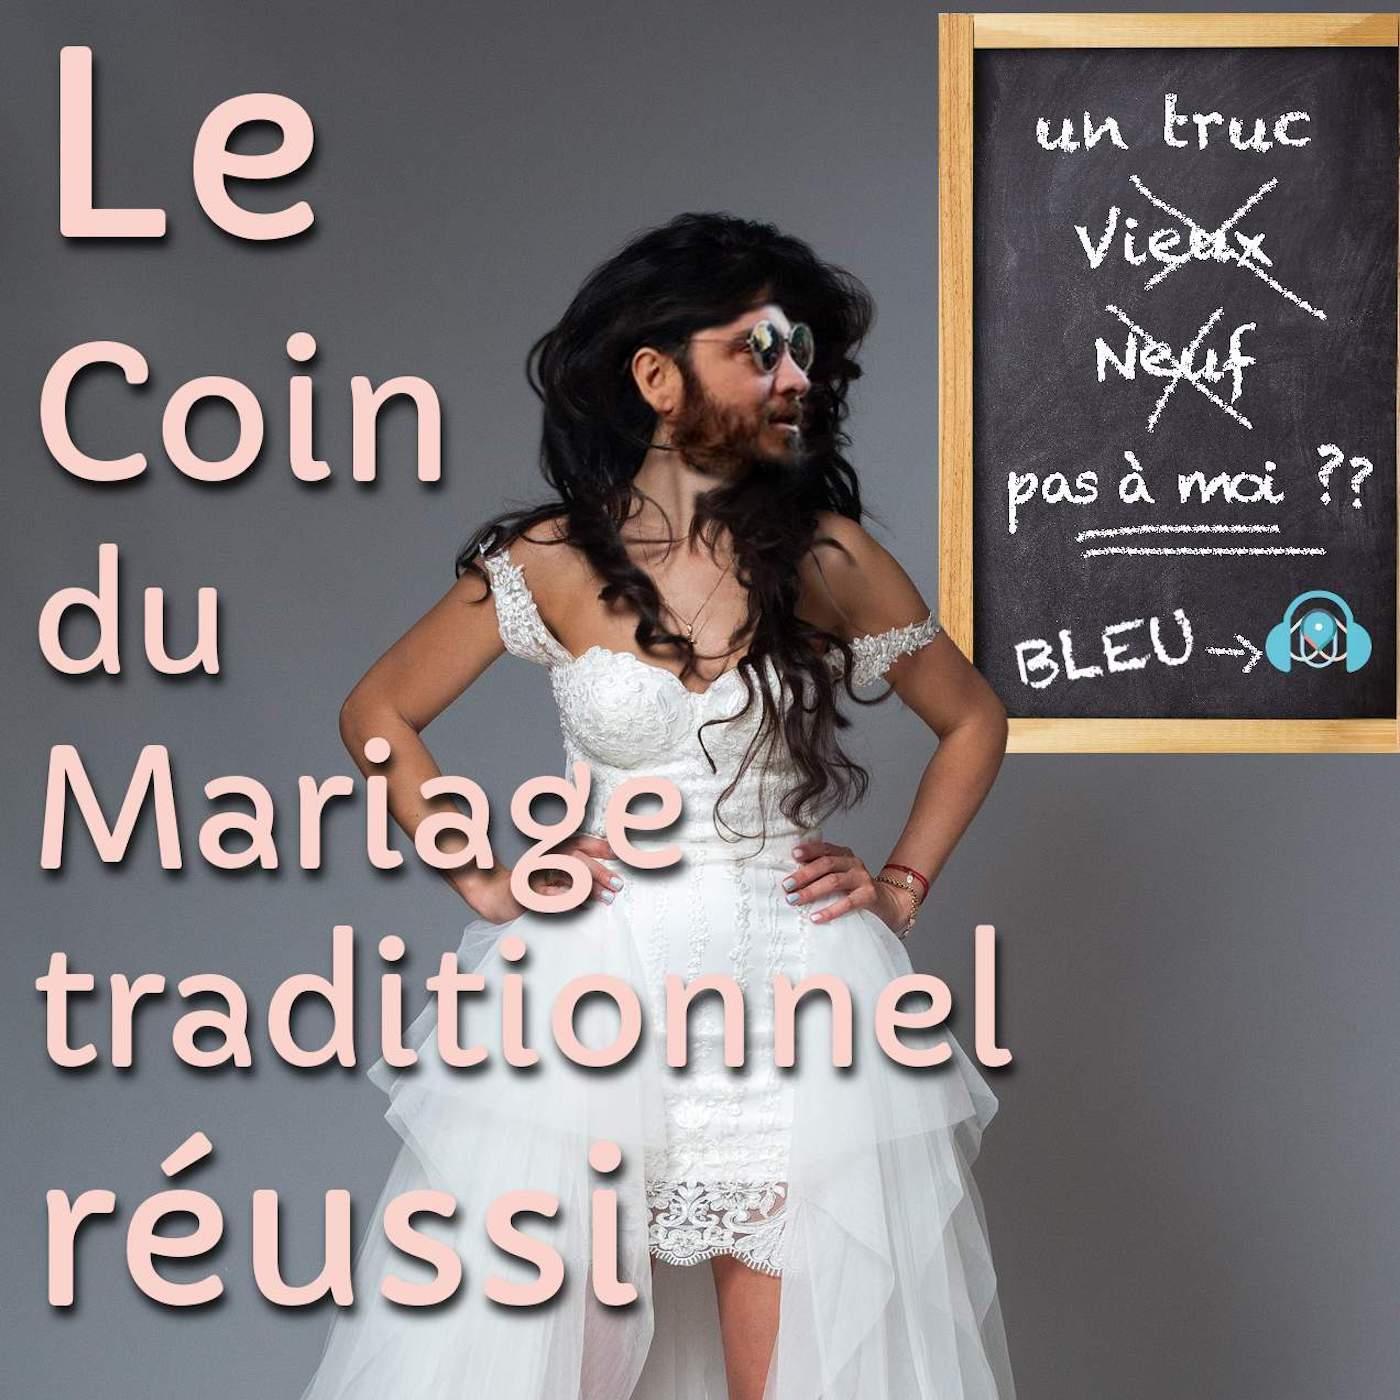 LE COIN DU MARIAGE TRADITIONNEL RÉUSSI S1E18 - Ambiance italienne